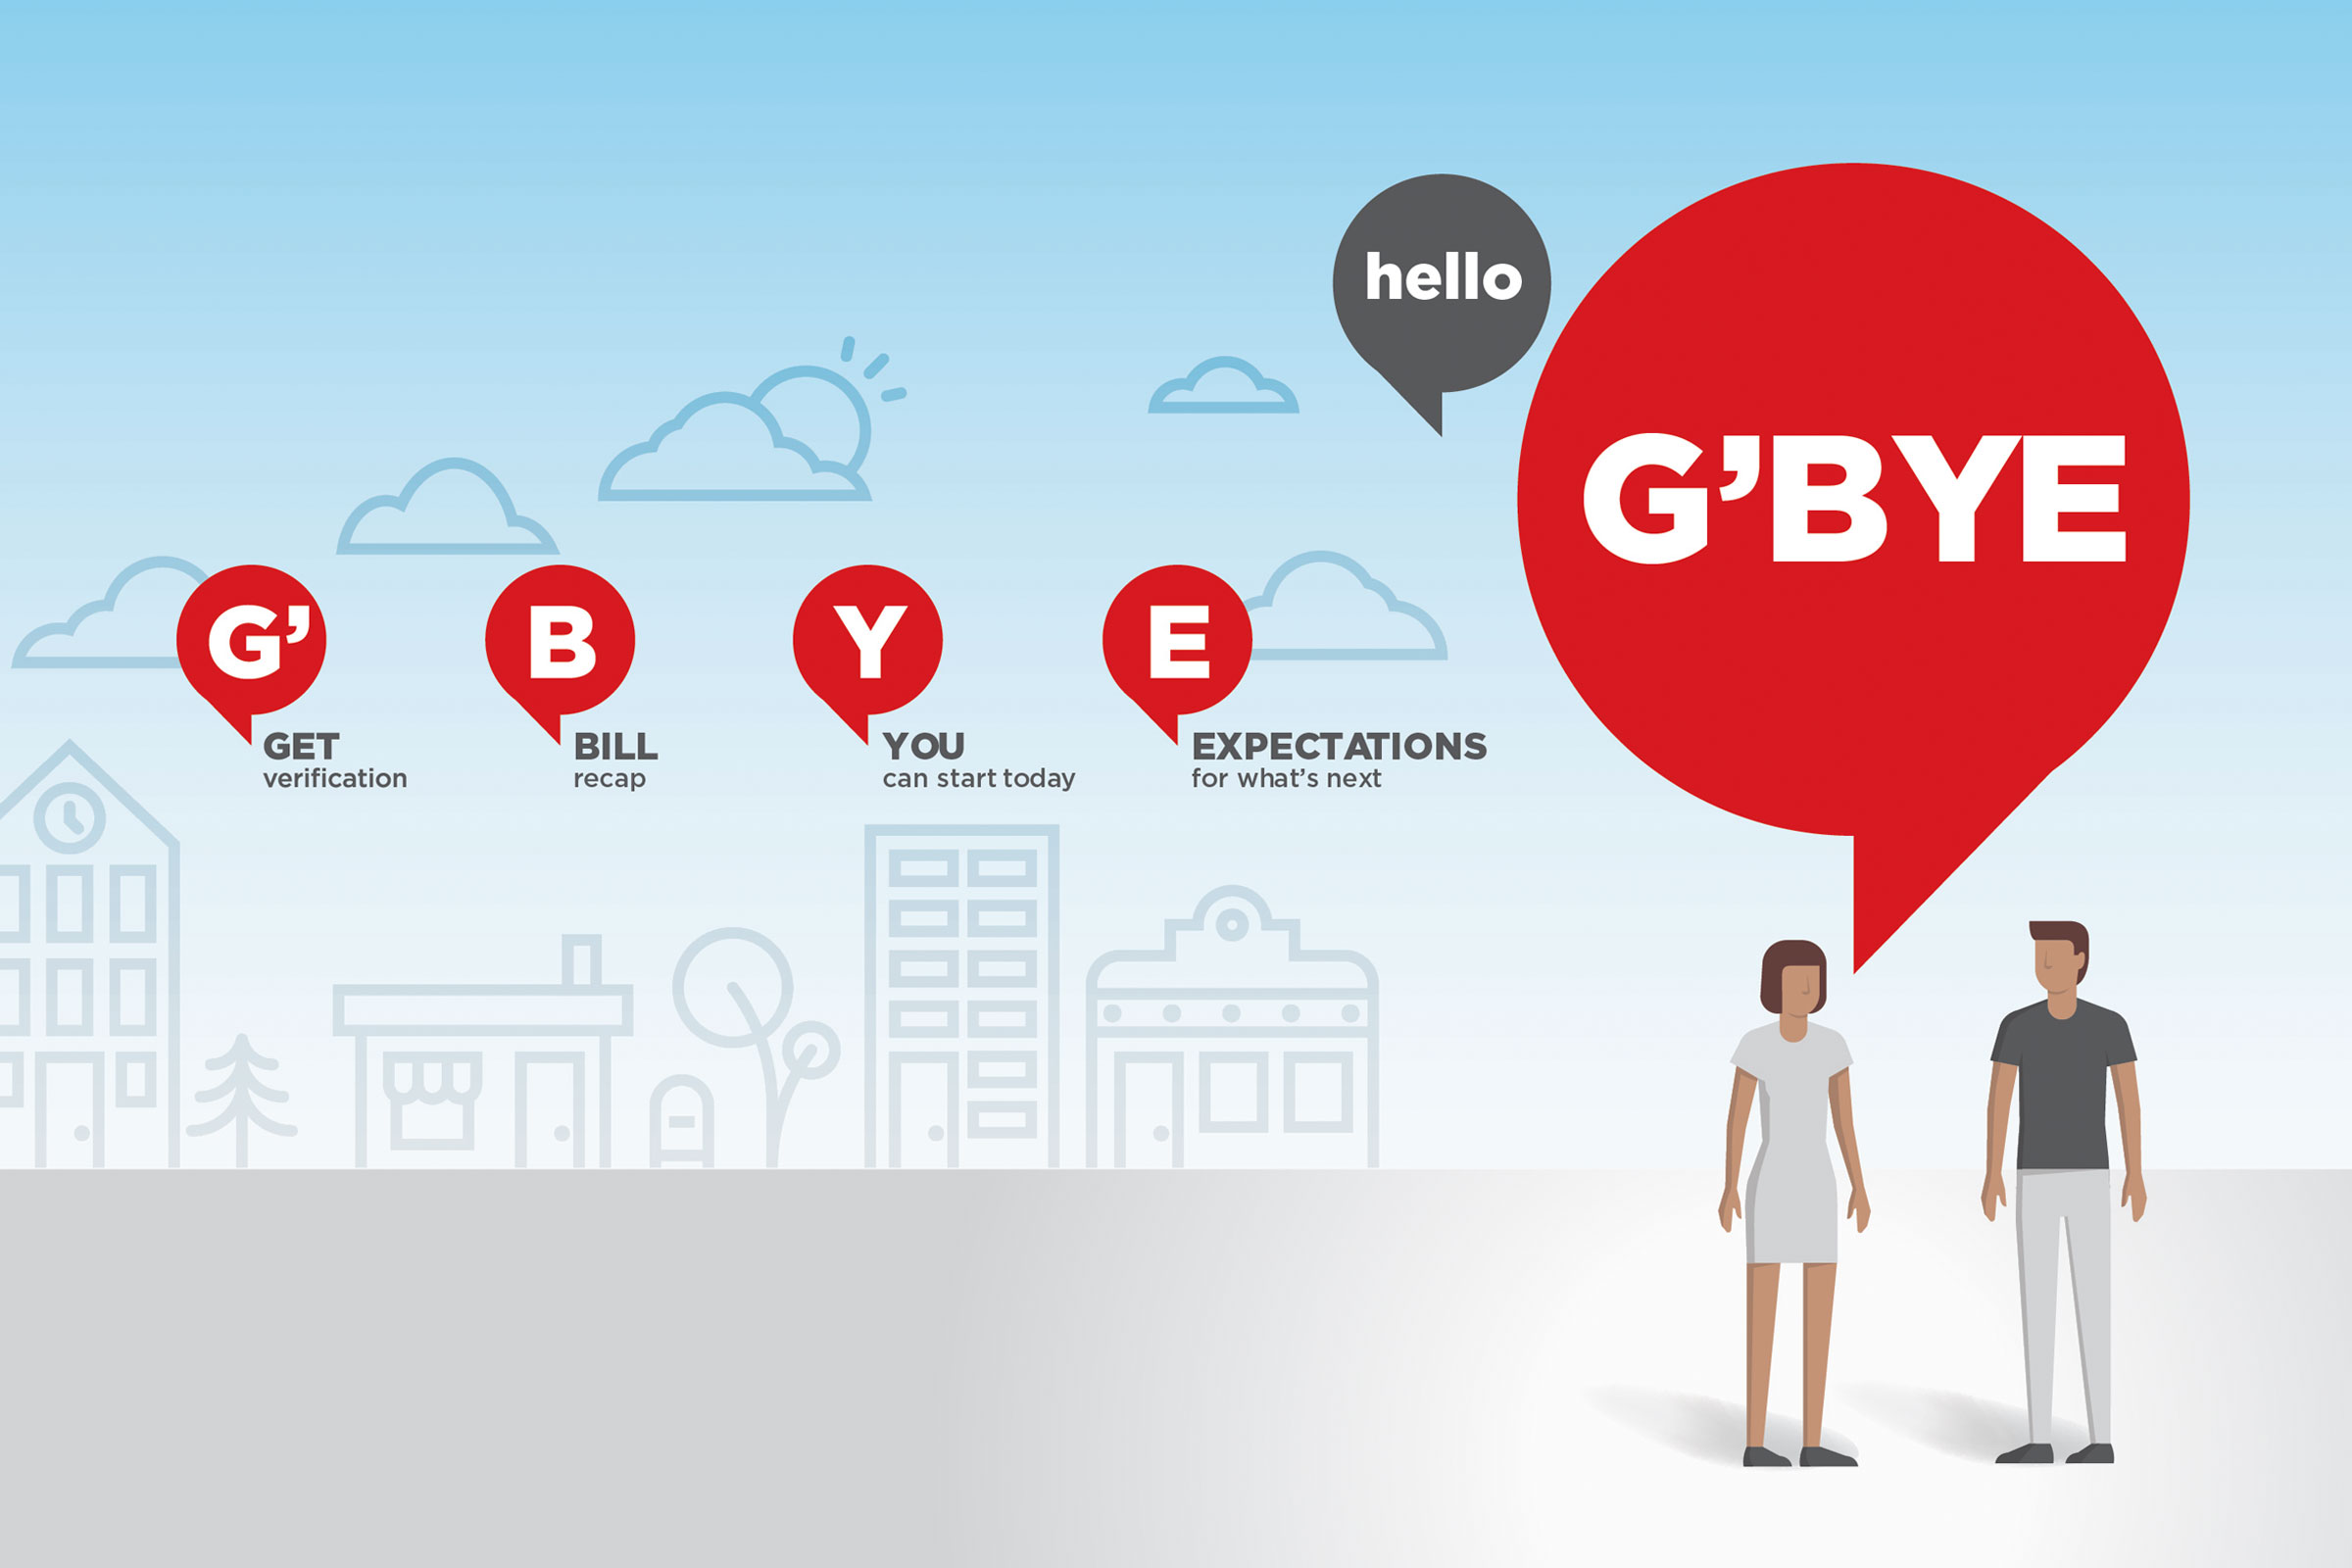 Gbye Infographic